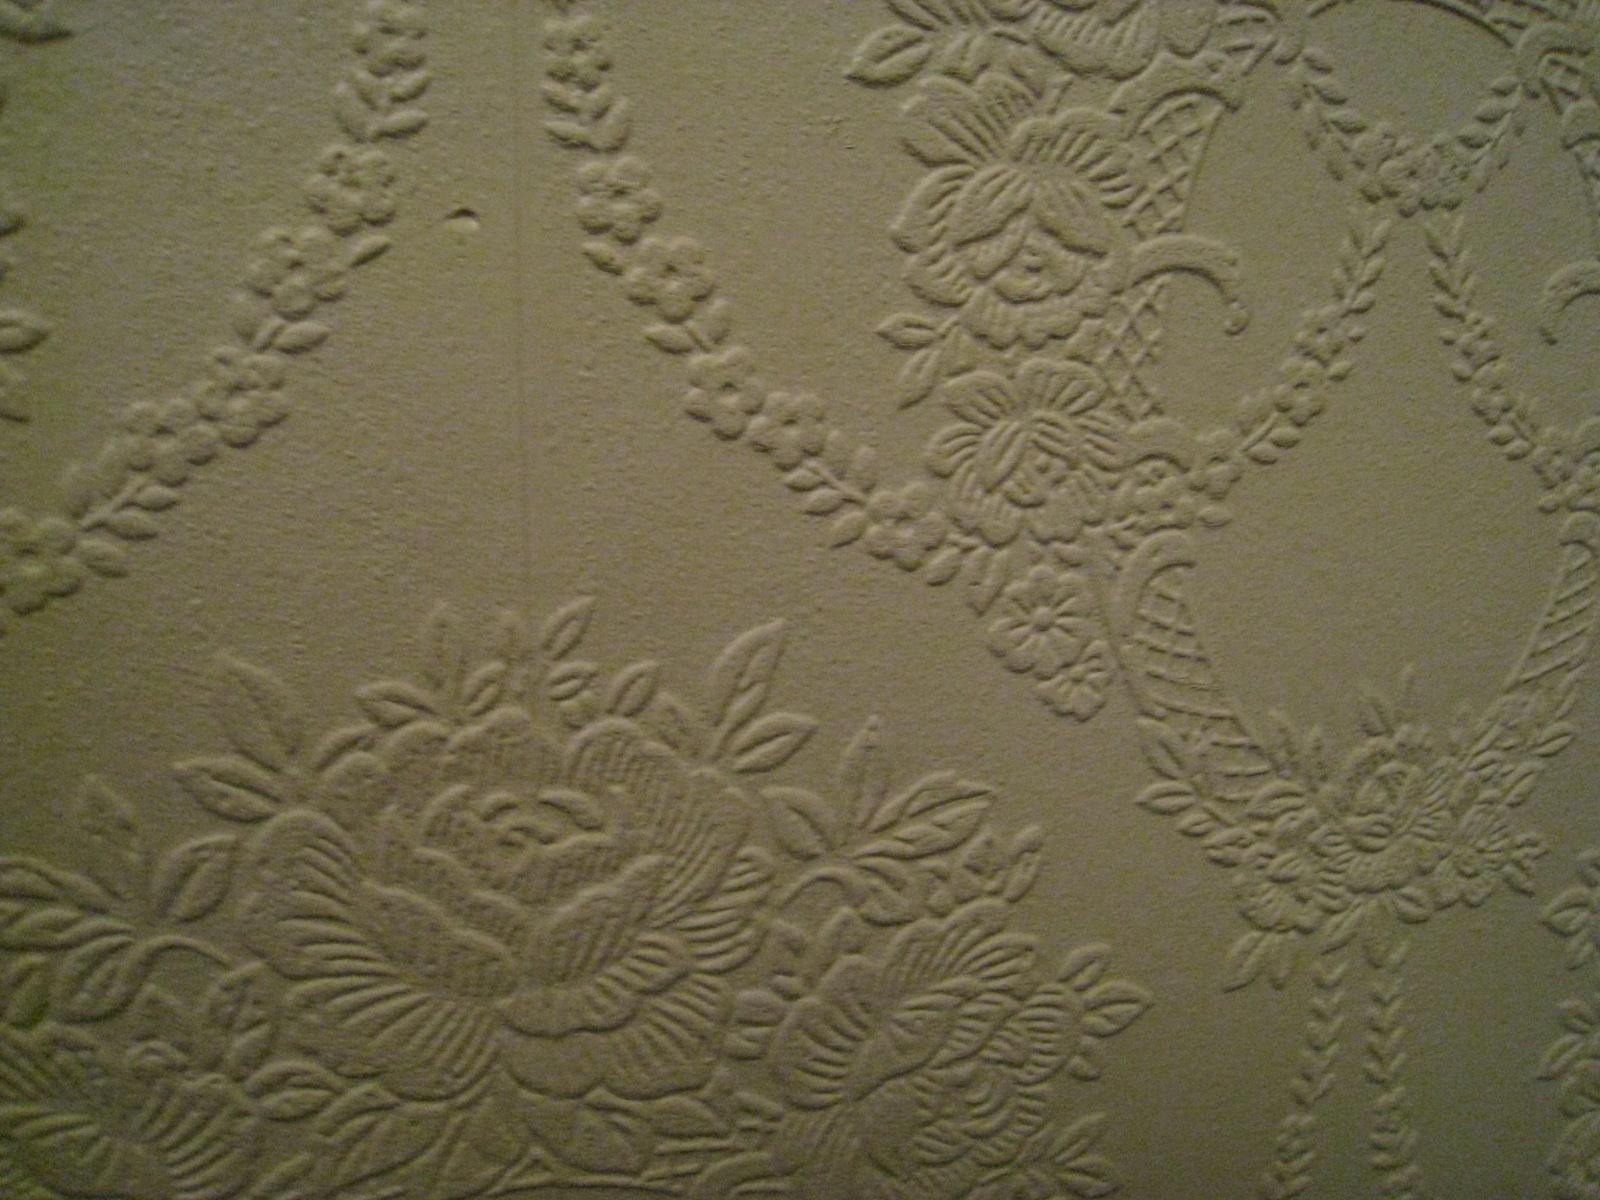 wood paneling Decorating tricks and tips weberlifedesignspeakscom 1600x1200